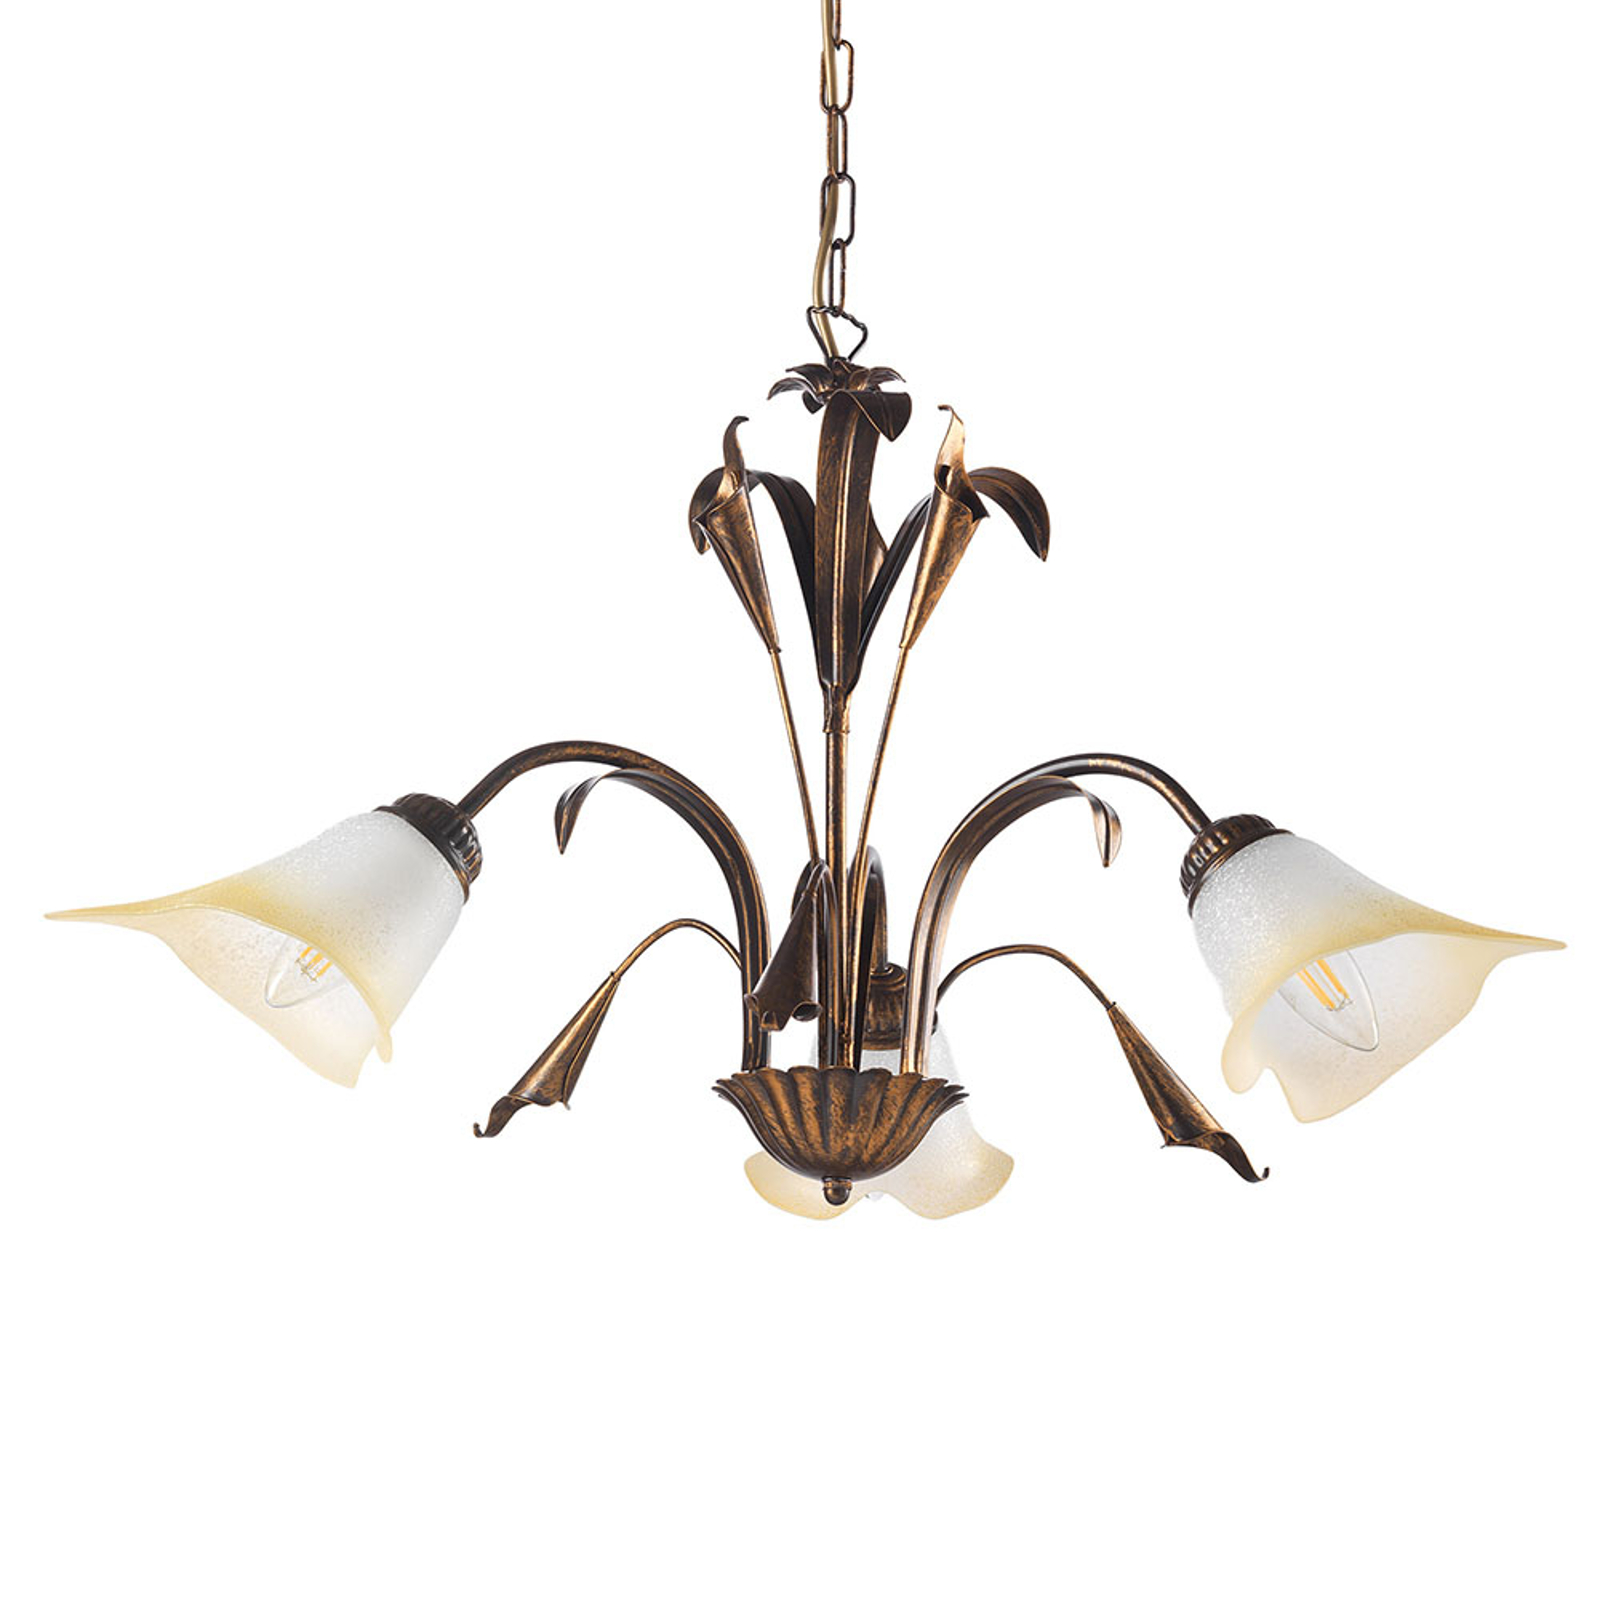 Lucrezia hængelampe, 3 lyskilder, bronze